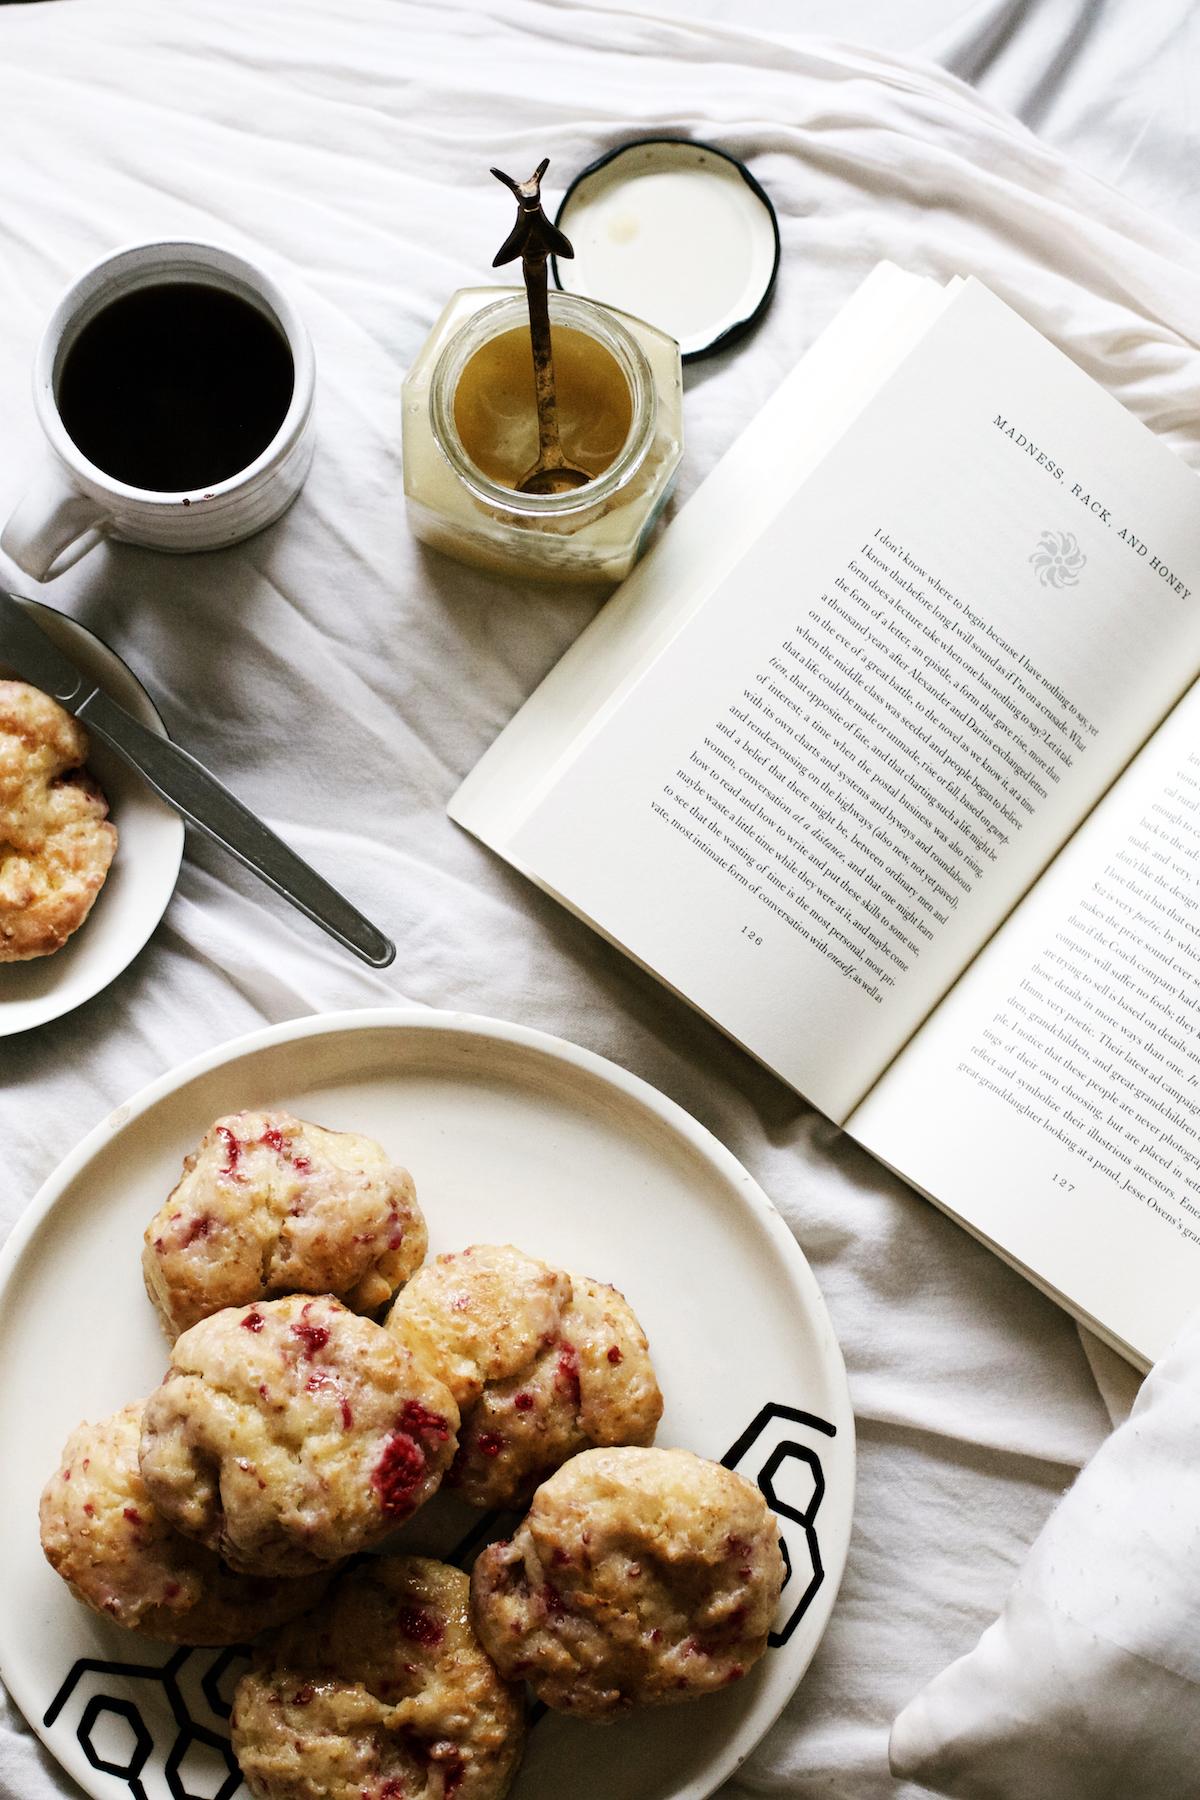 Honey-Glazed Raspberry Lemon Scones / Madness, Rack, + Honey / Books + Breakfast by Ruby Josephine